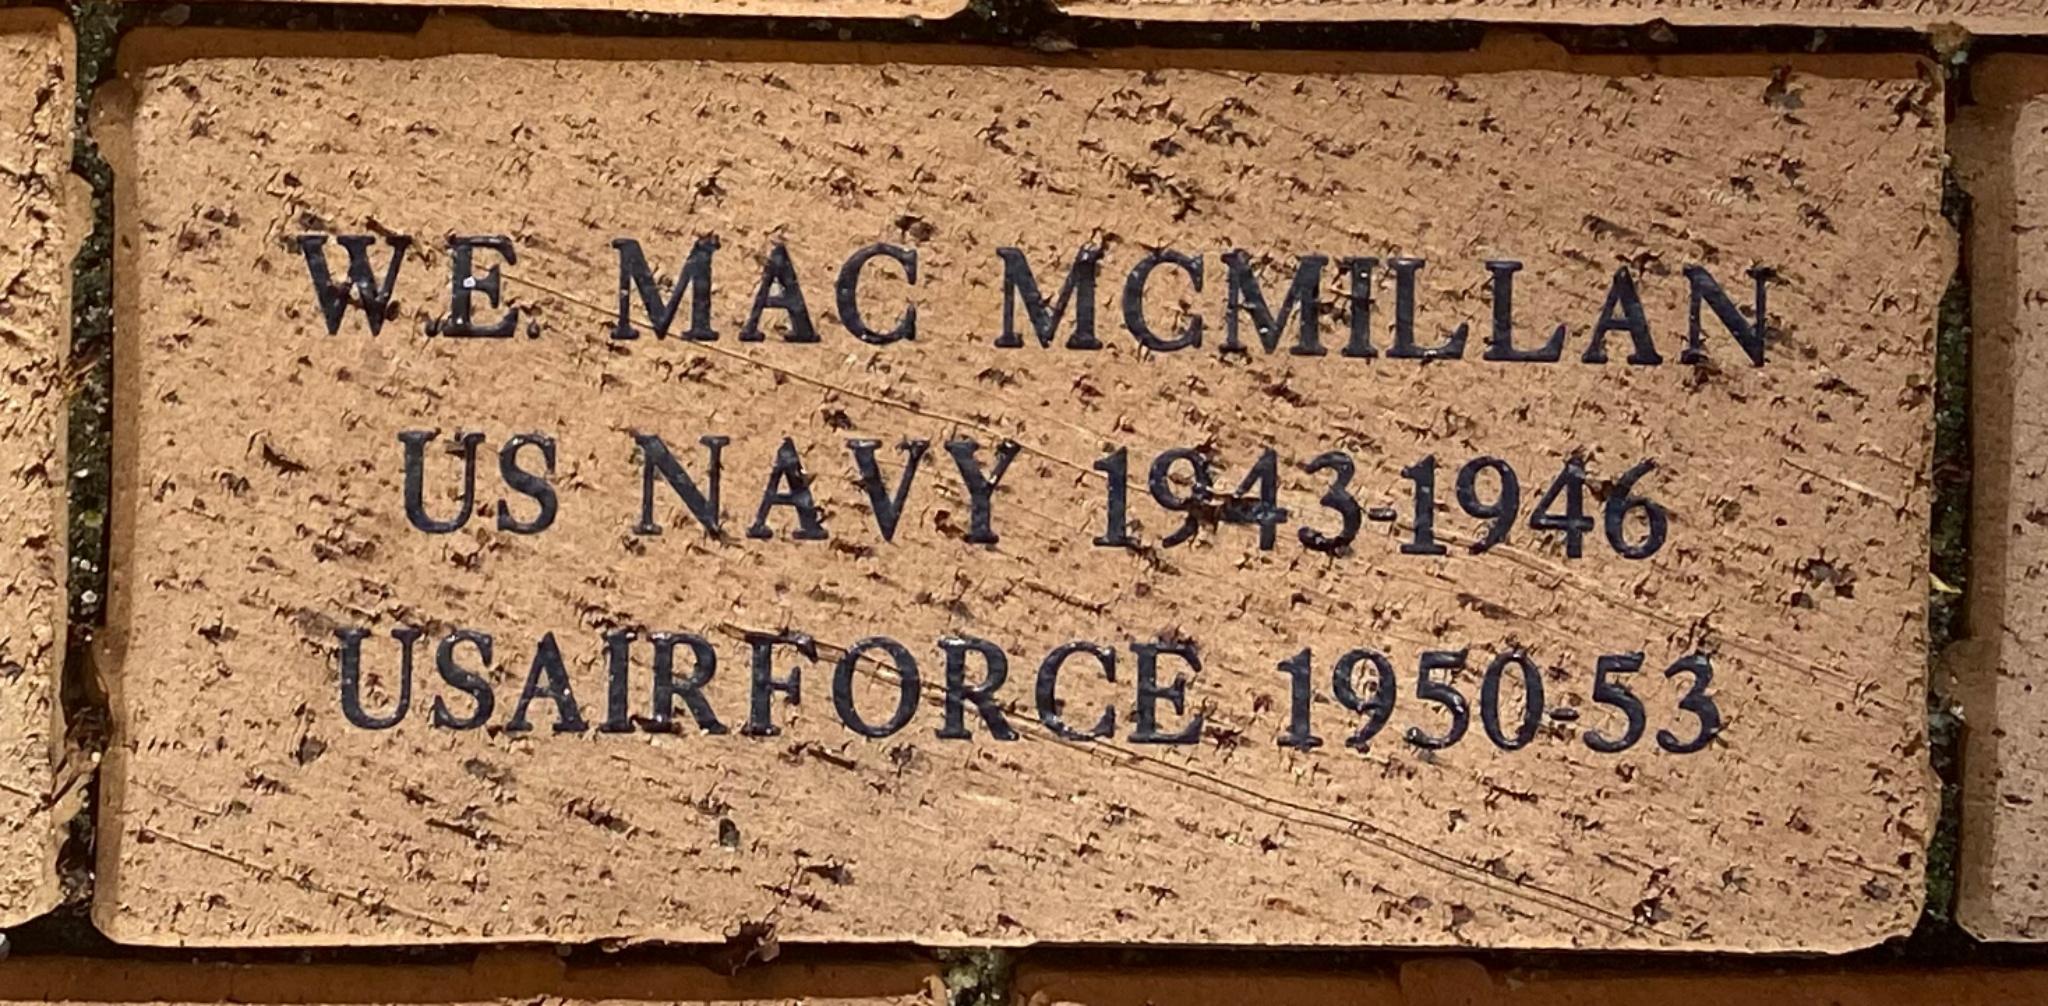 W.E. MAC MCMILLAN US NAVY 1943-1946 US AIRFORCE 1950-53